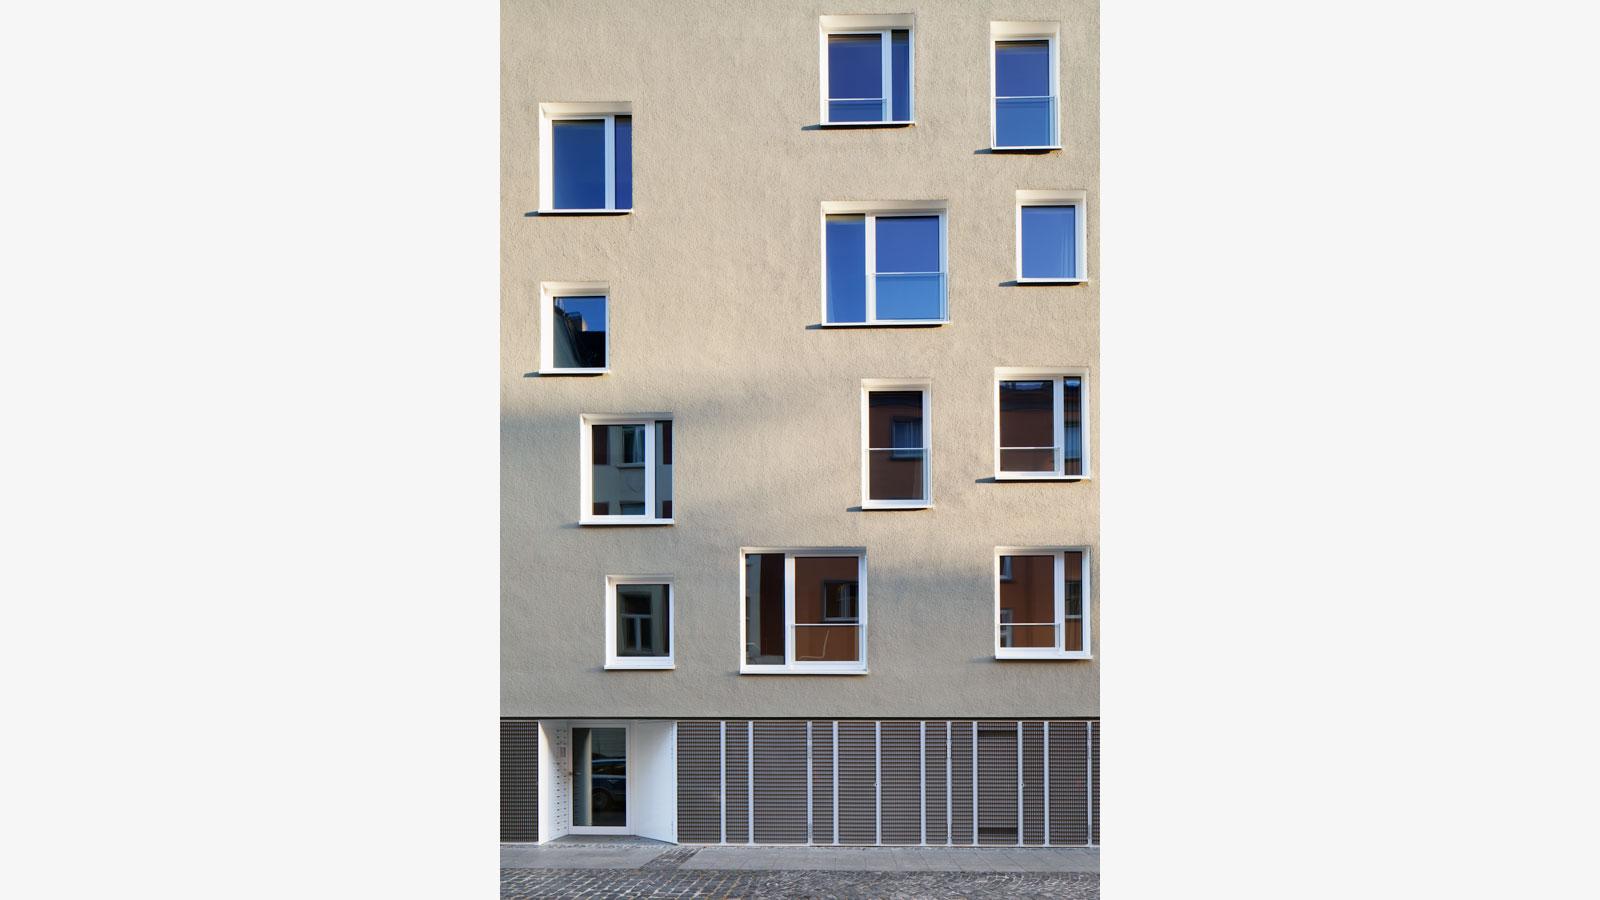 Studierendenwohnheim Krausfeld